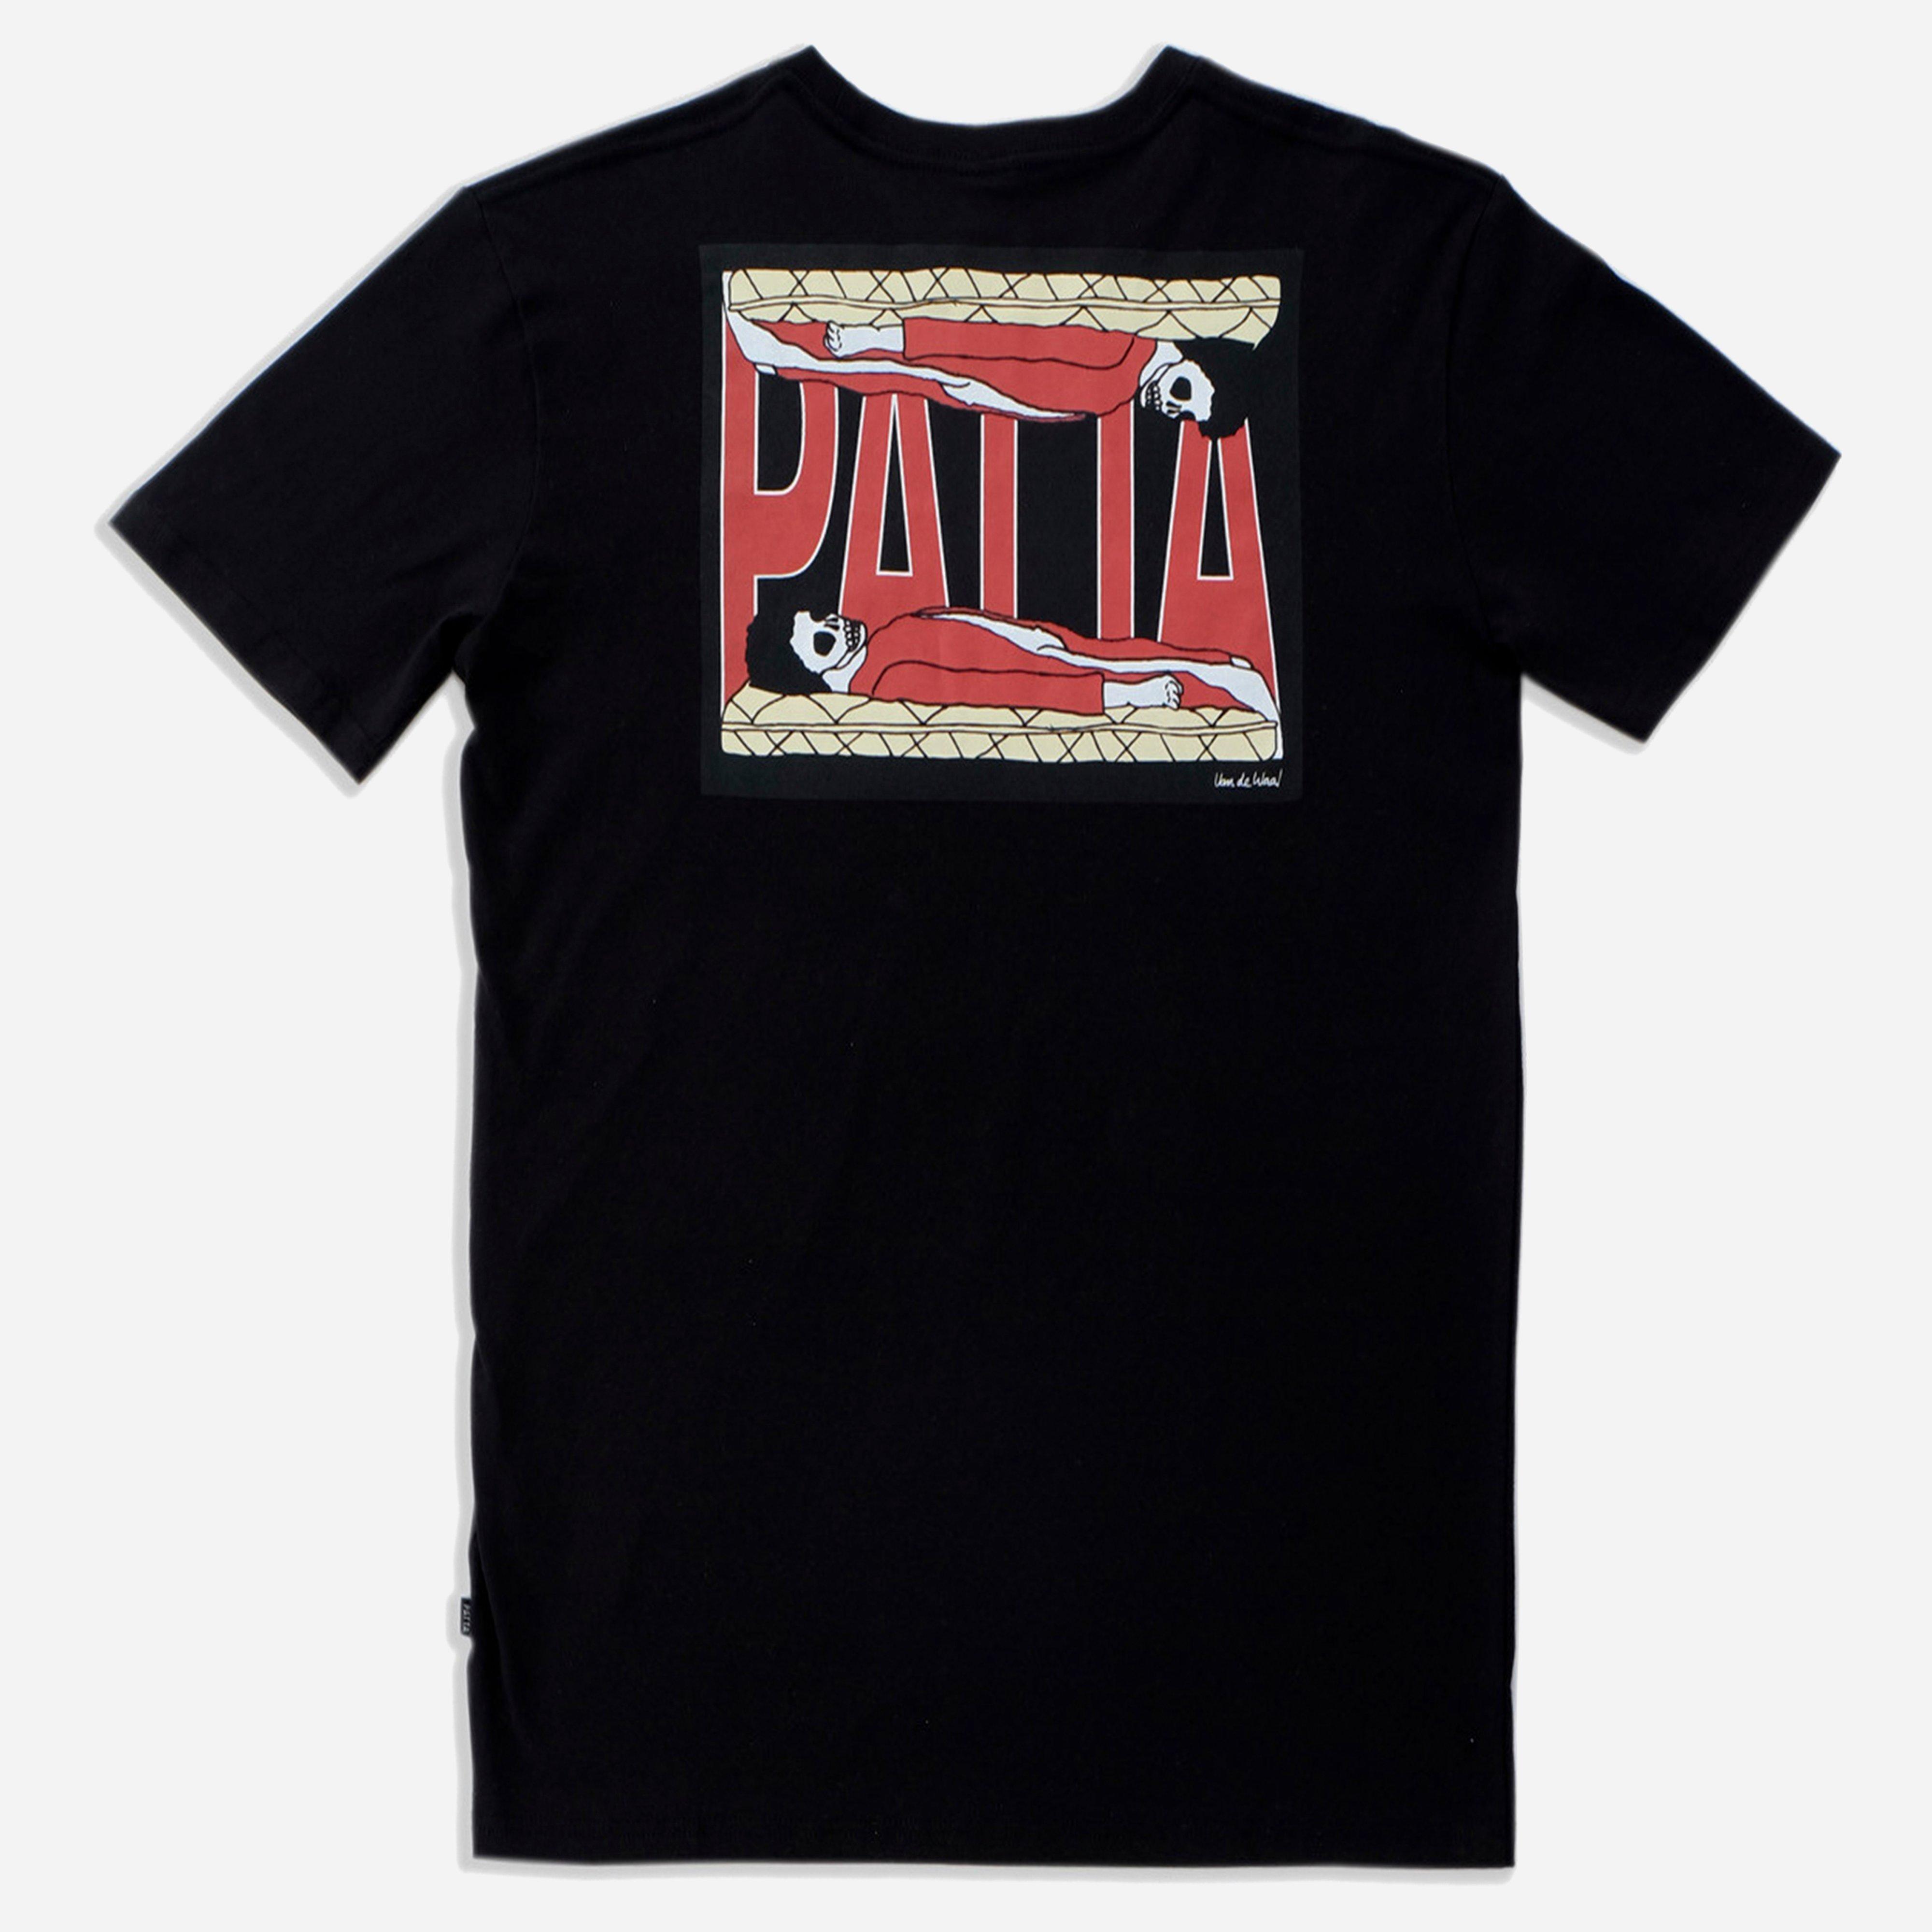 Patta Rest Easy T-shirt